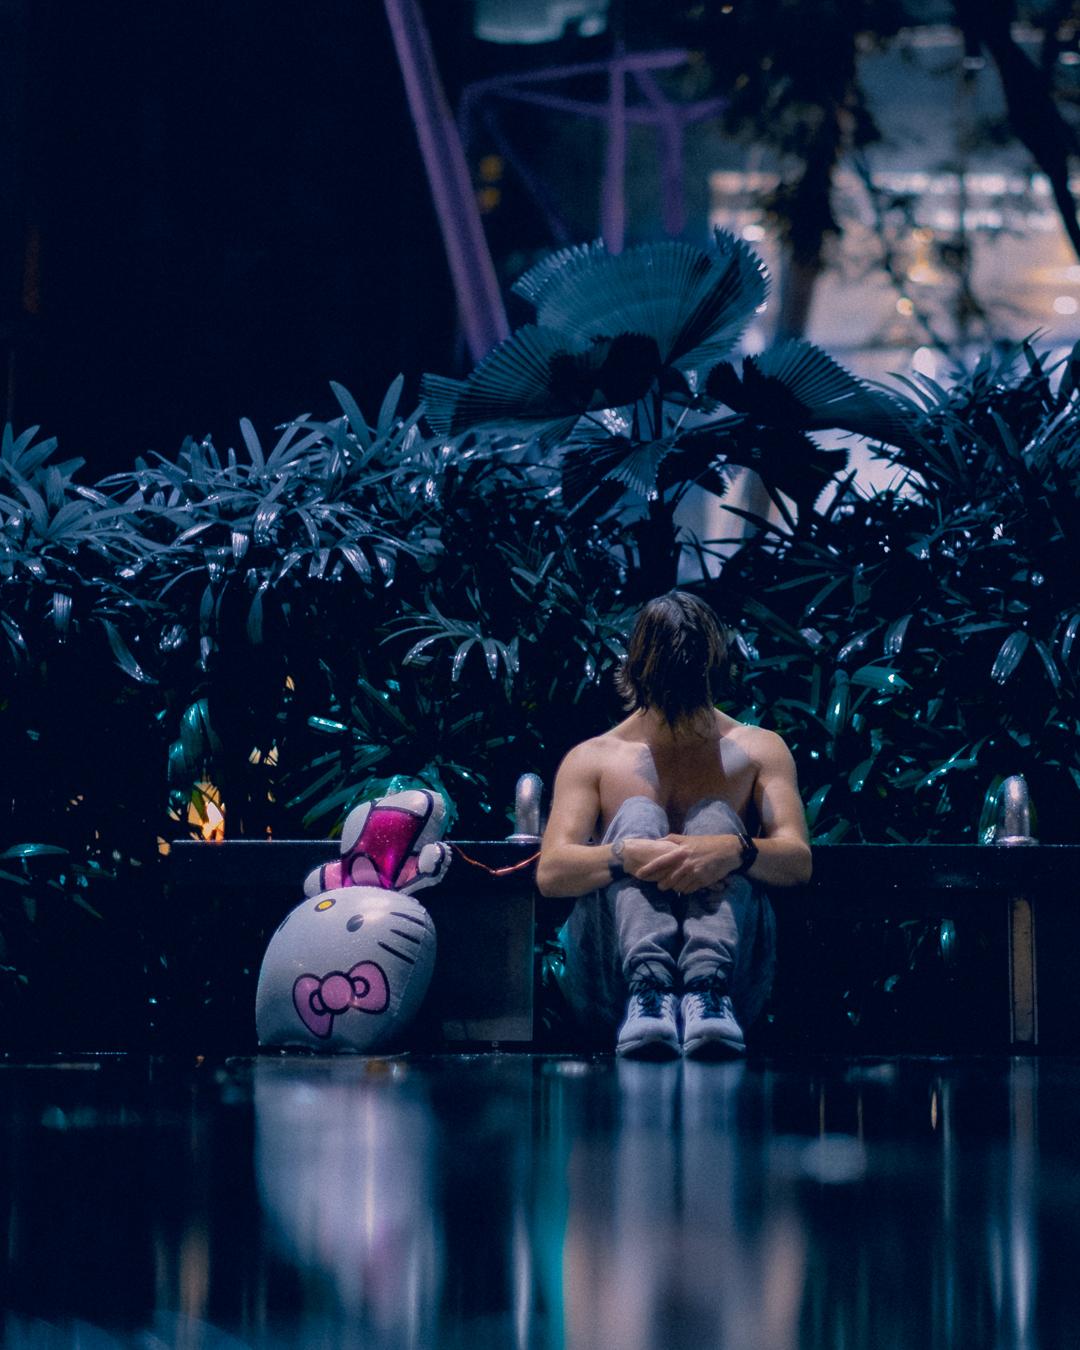 portrait of zaccy meditating in the rain